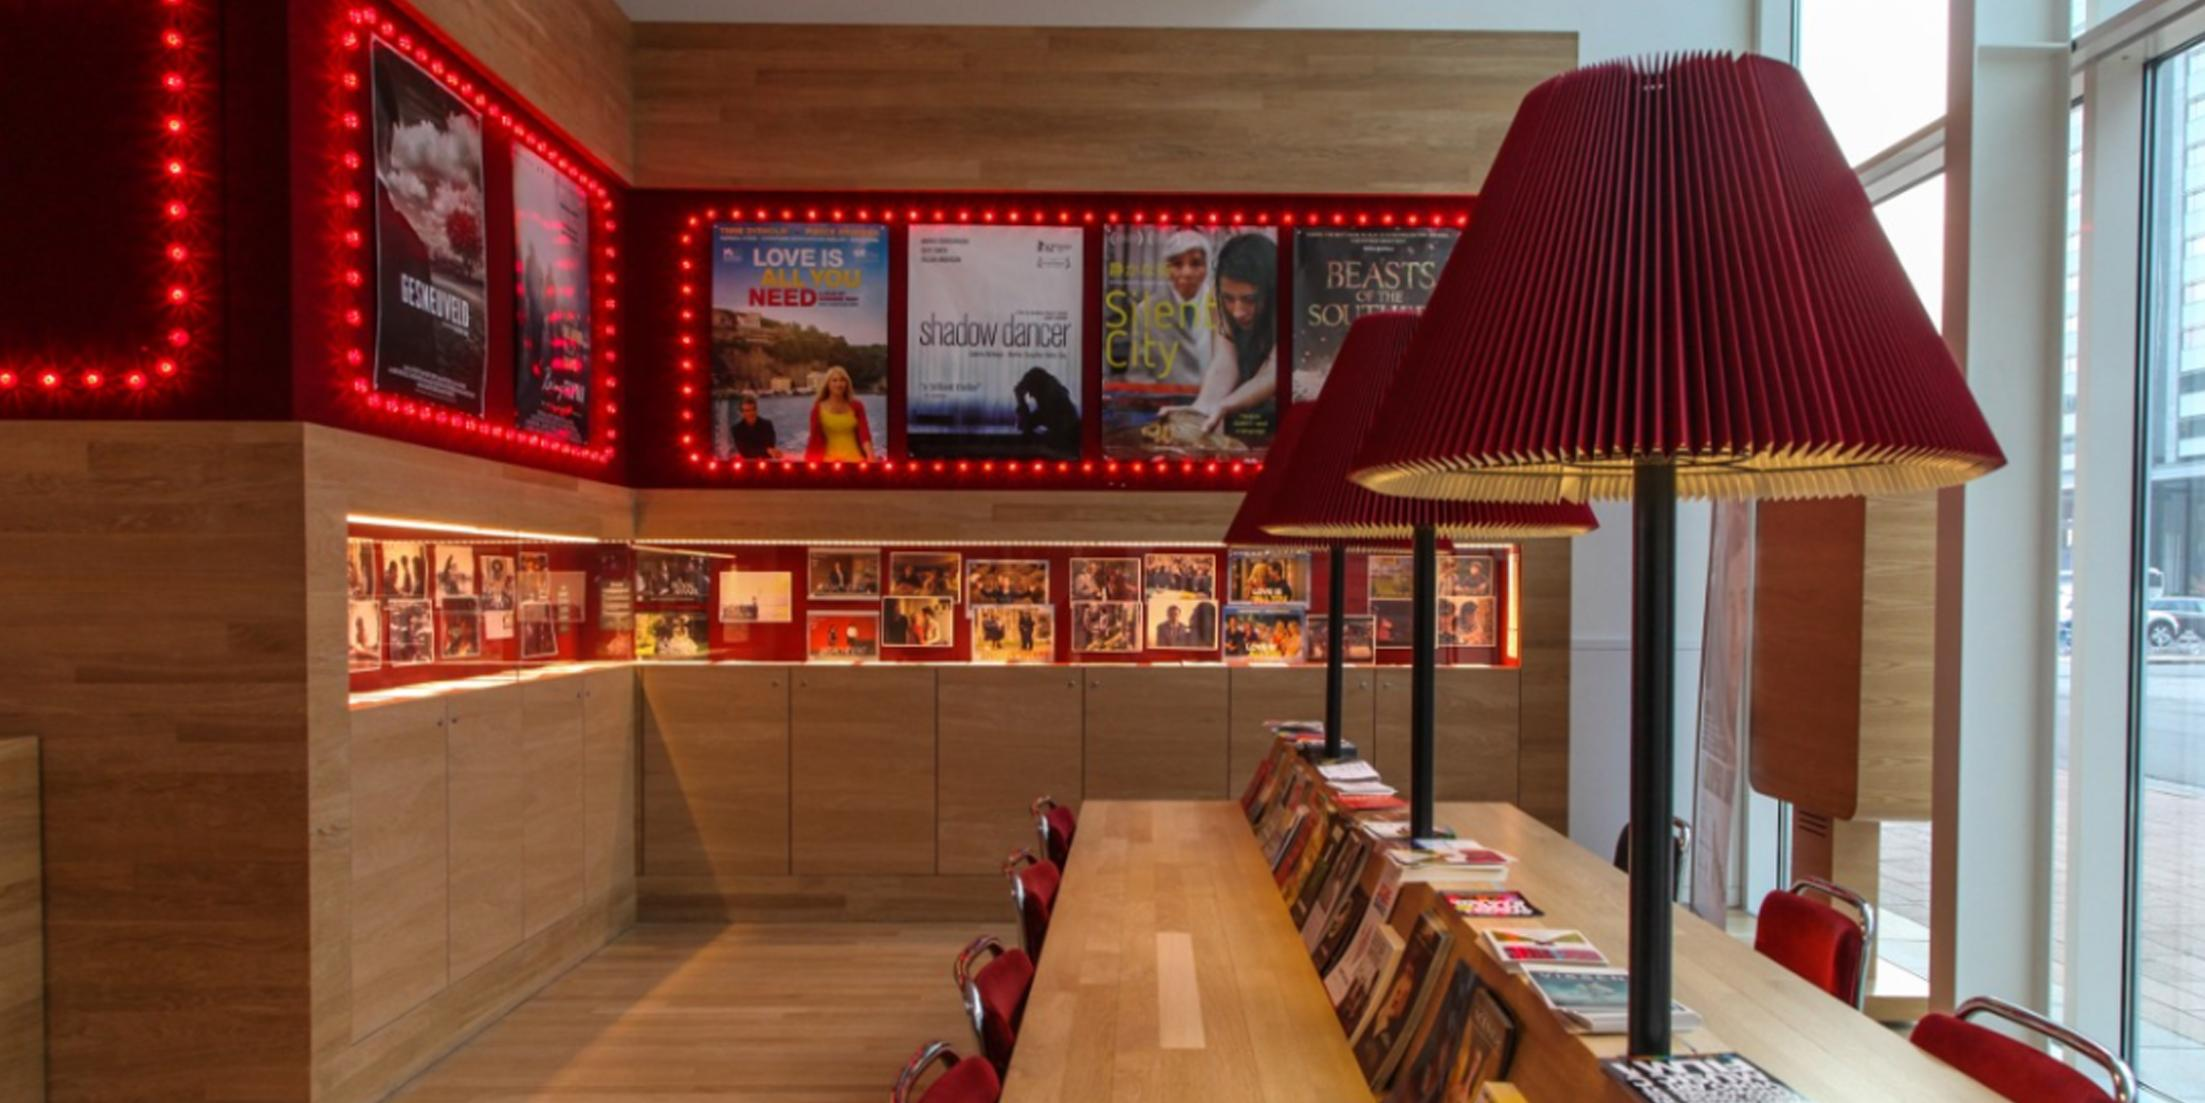 Atelier lek onafhankelijk lichtontwerp lantaren venster for Venster lantaarn rotterdam